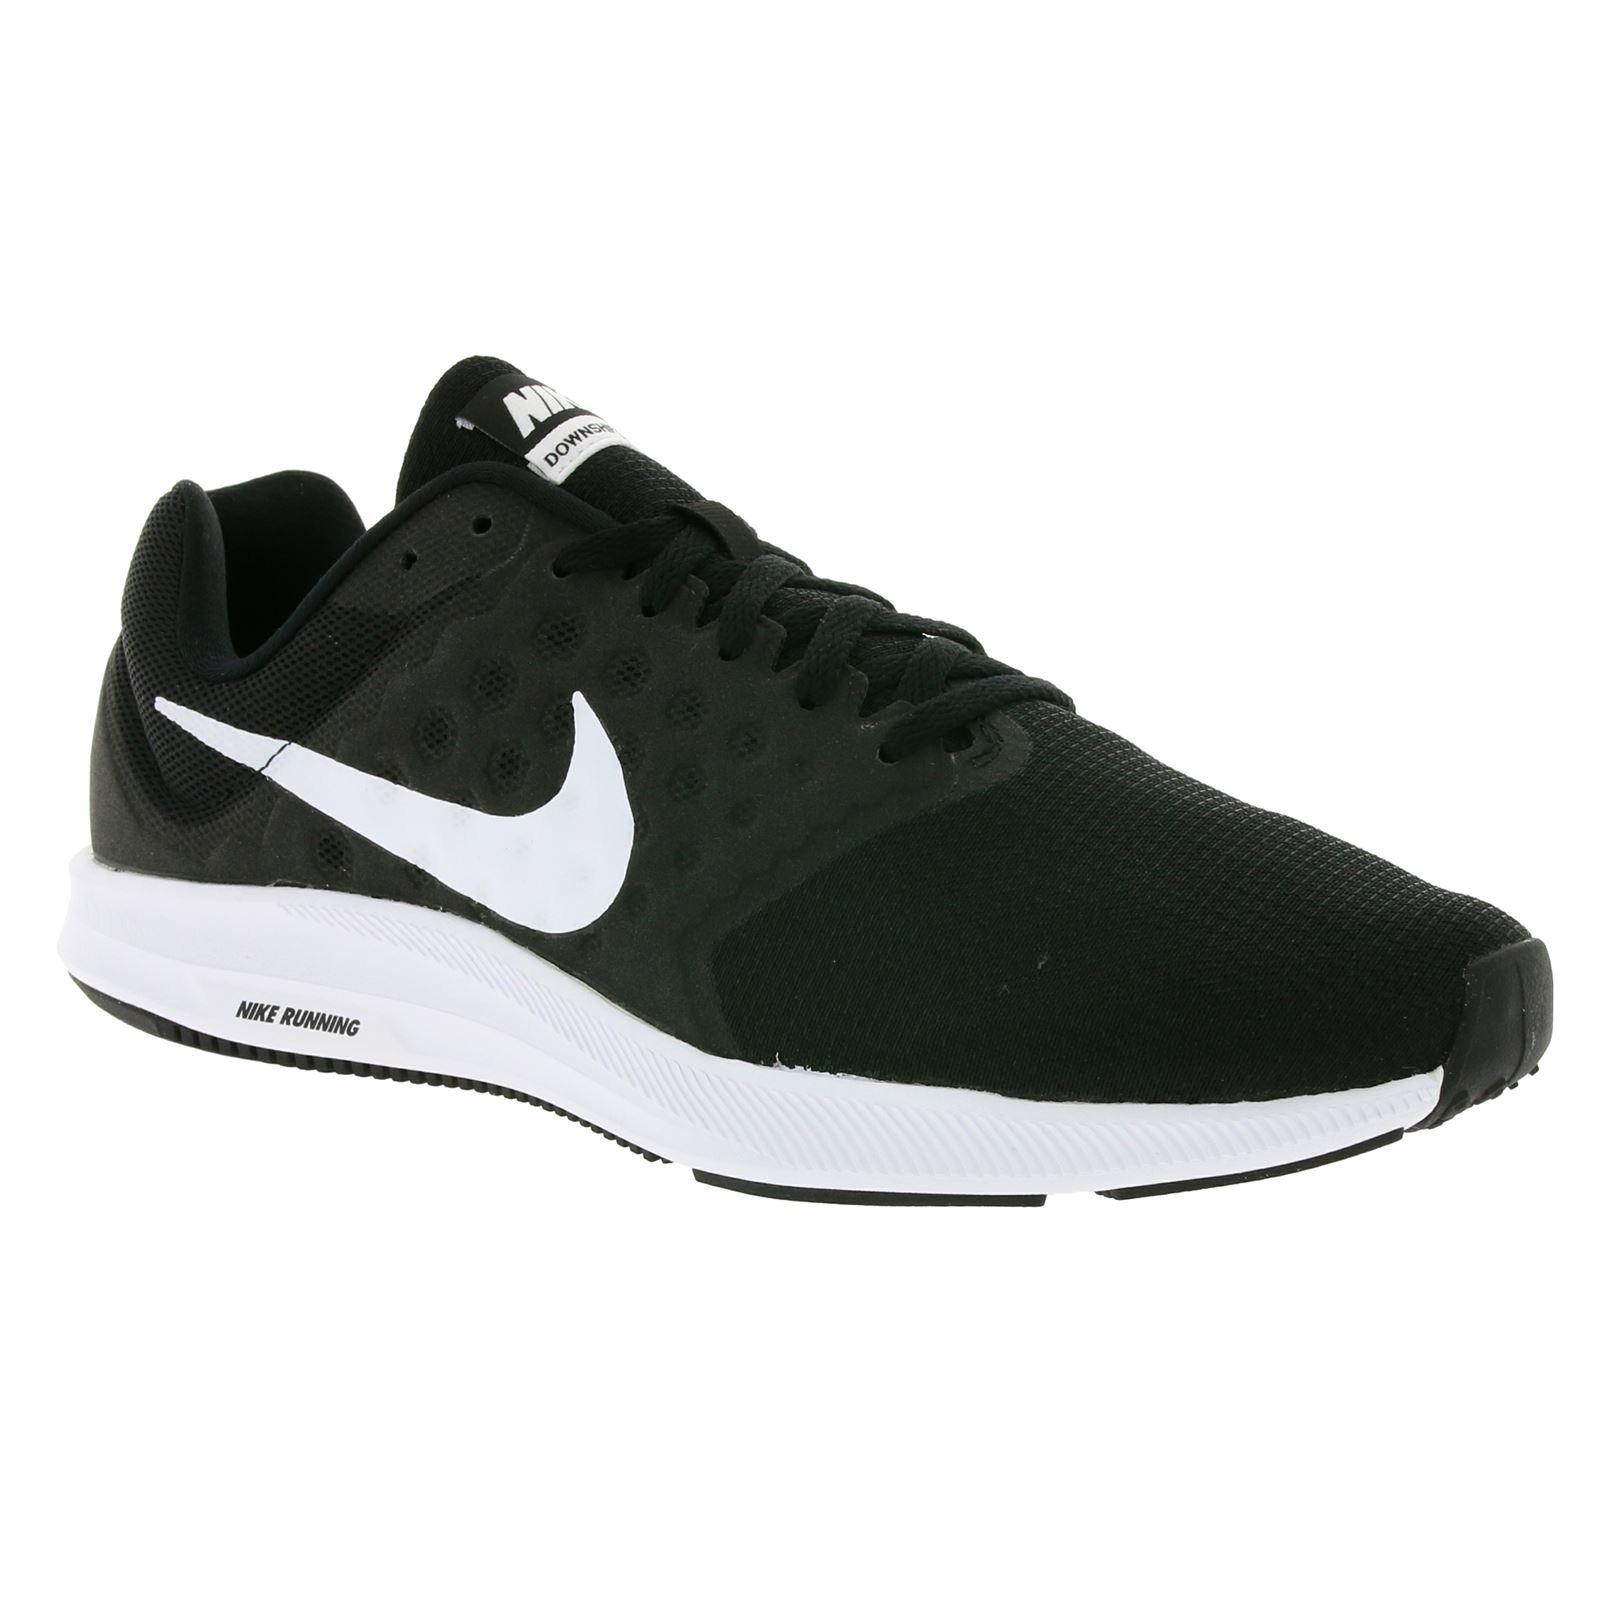 Amazon.com: Nike 852459-002: Men's